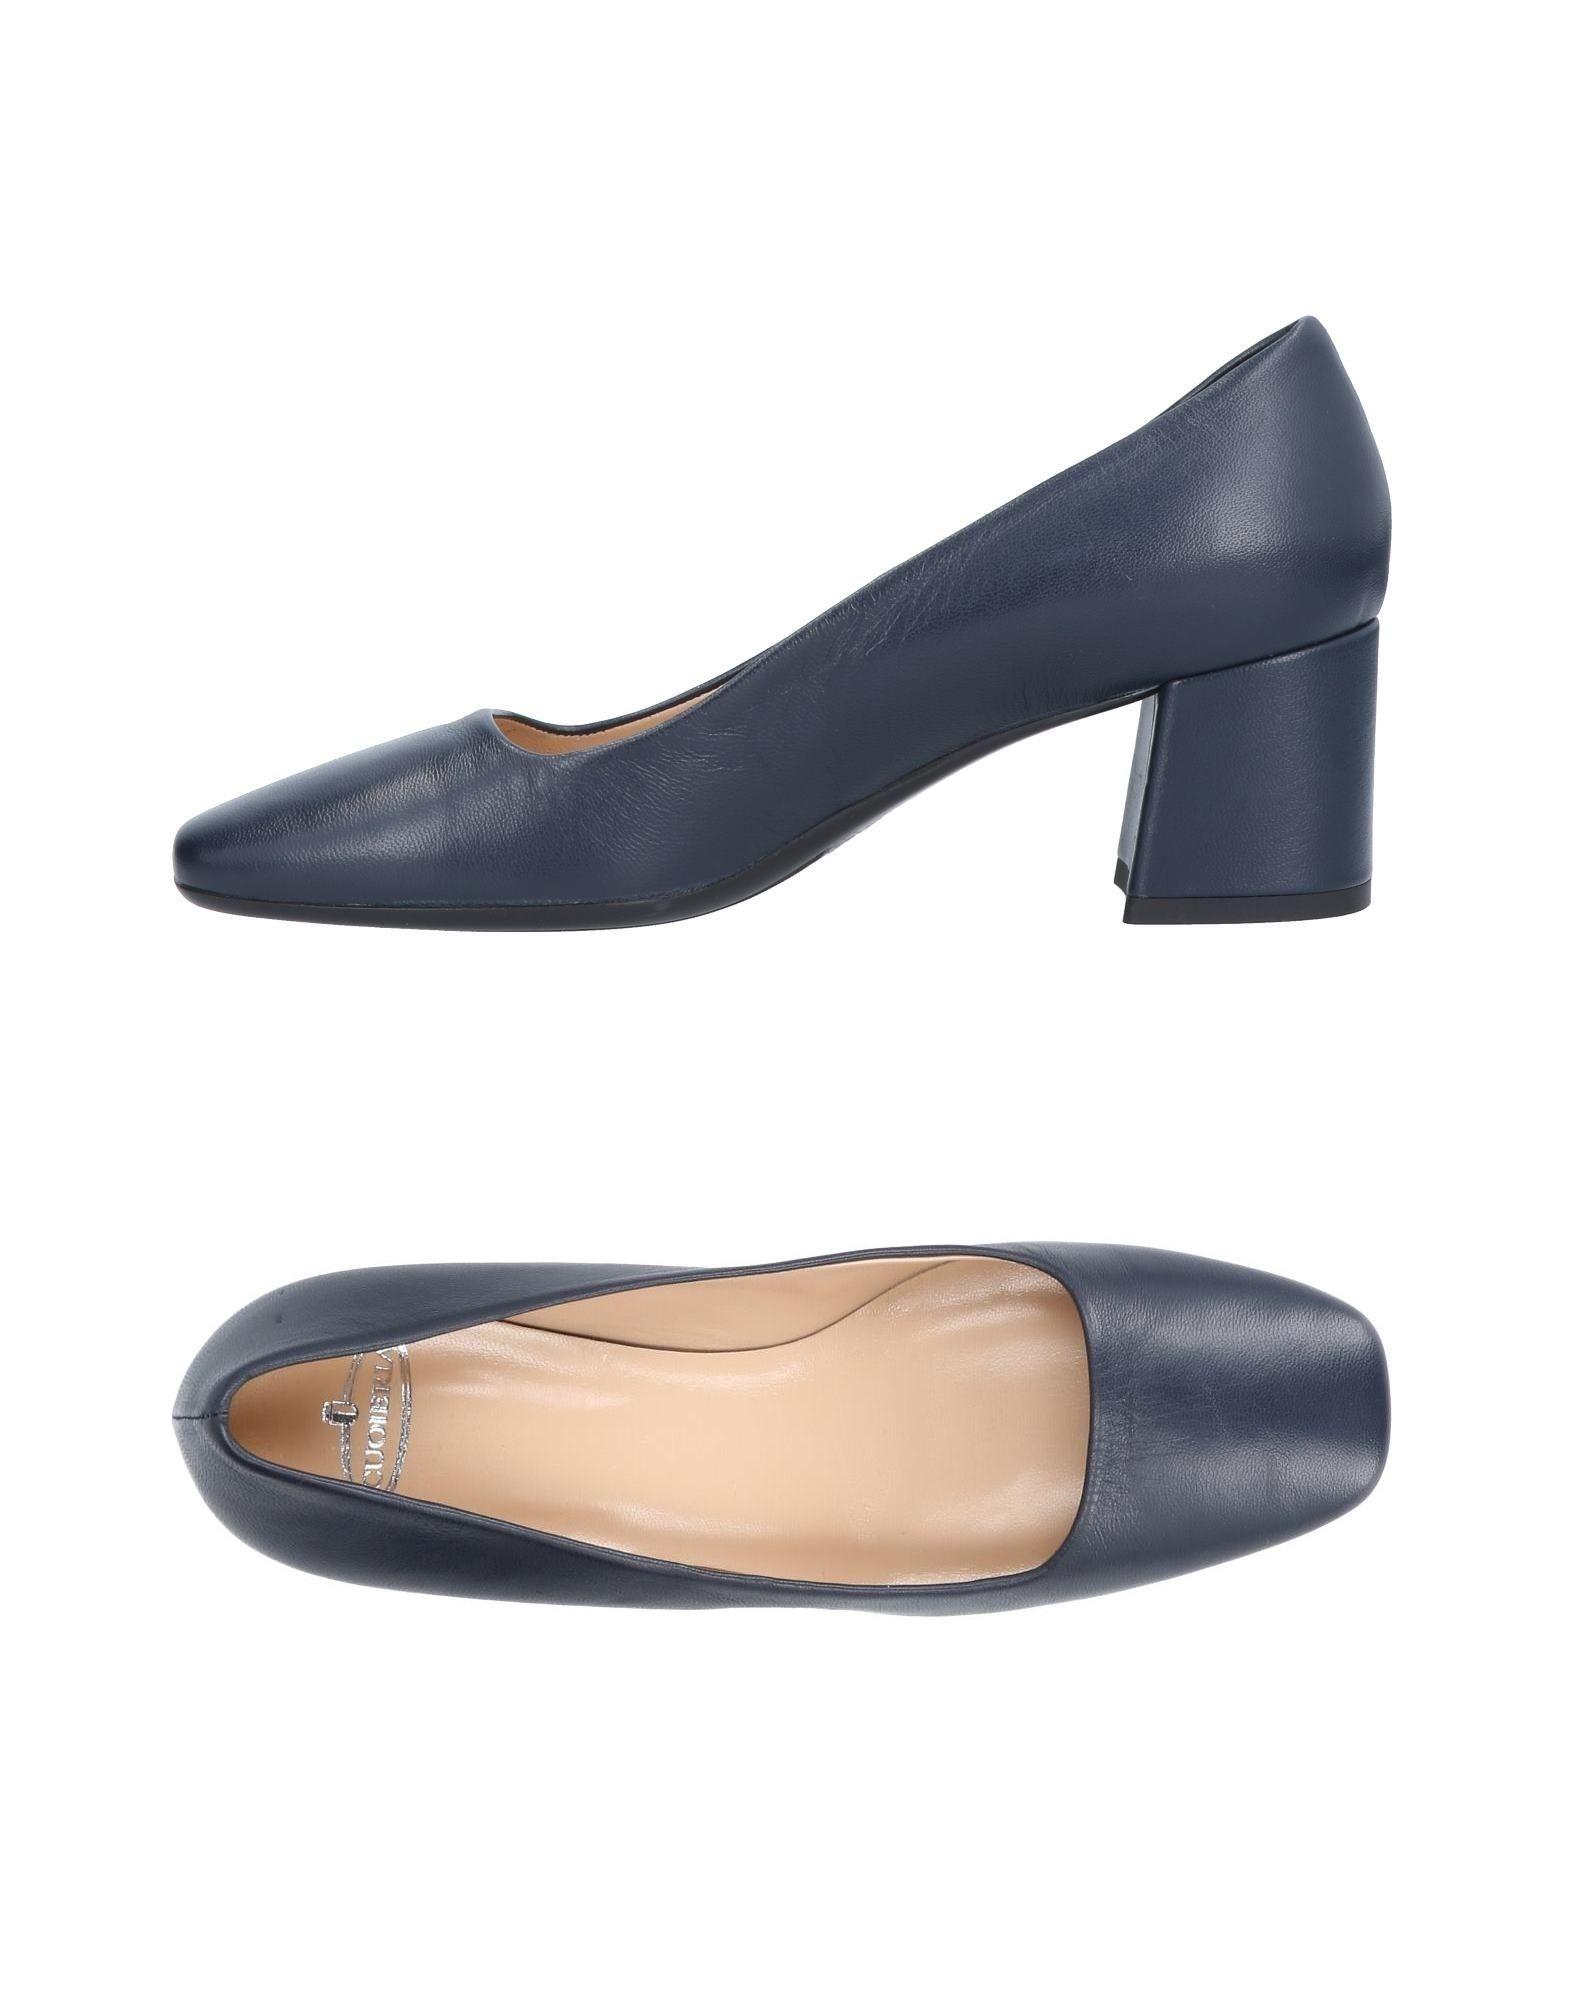 Cuoieria Pumps Damen  11487345KH Gute Qualität beliebte Schuhe